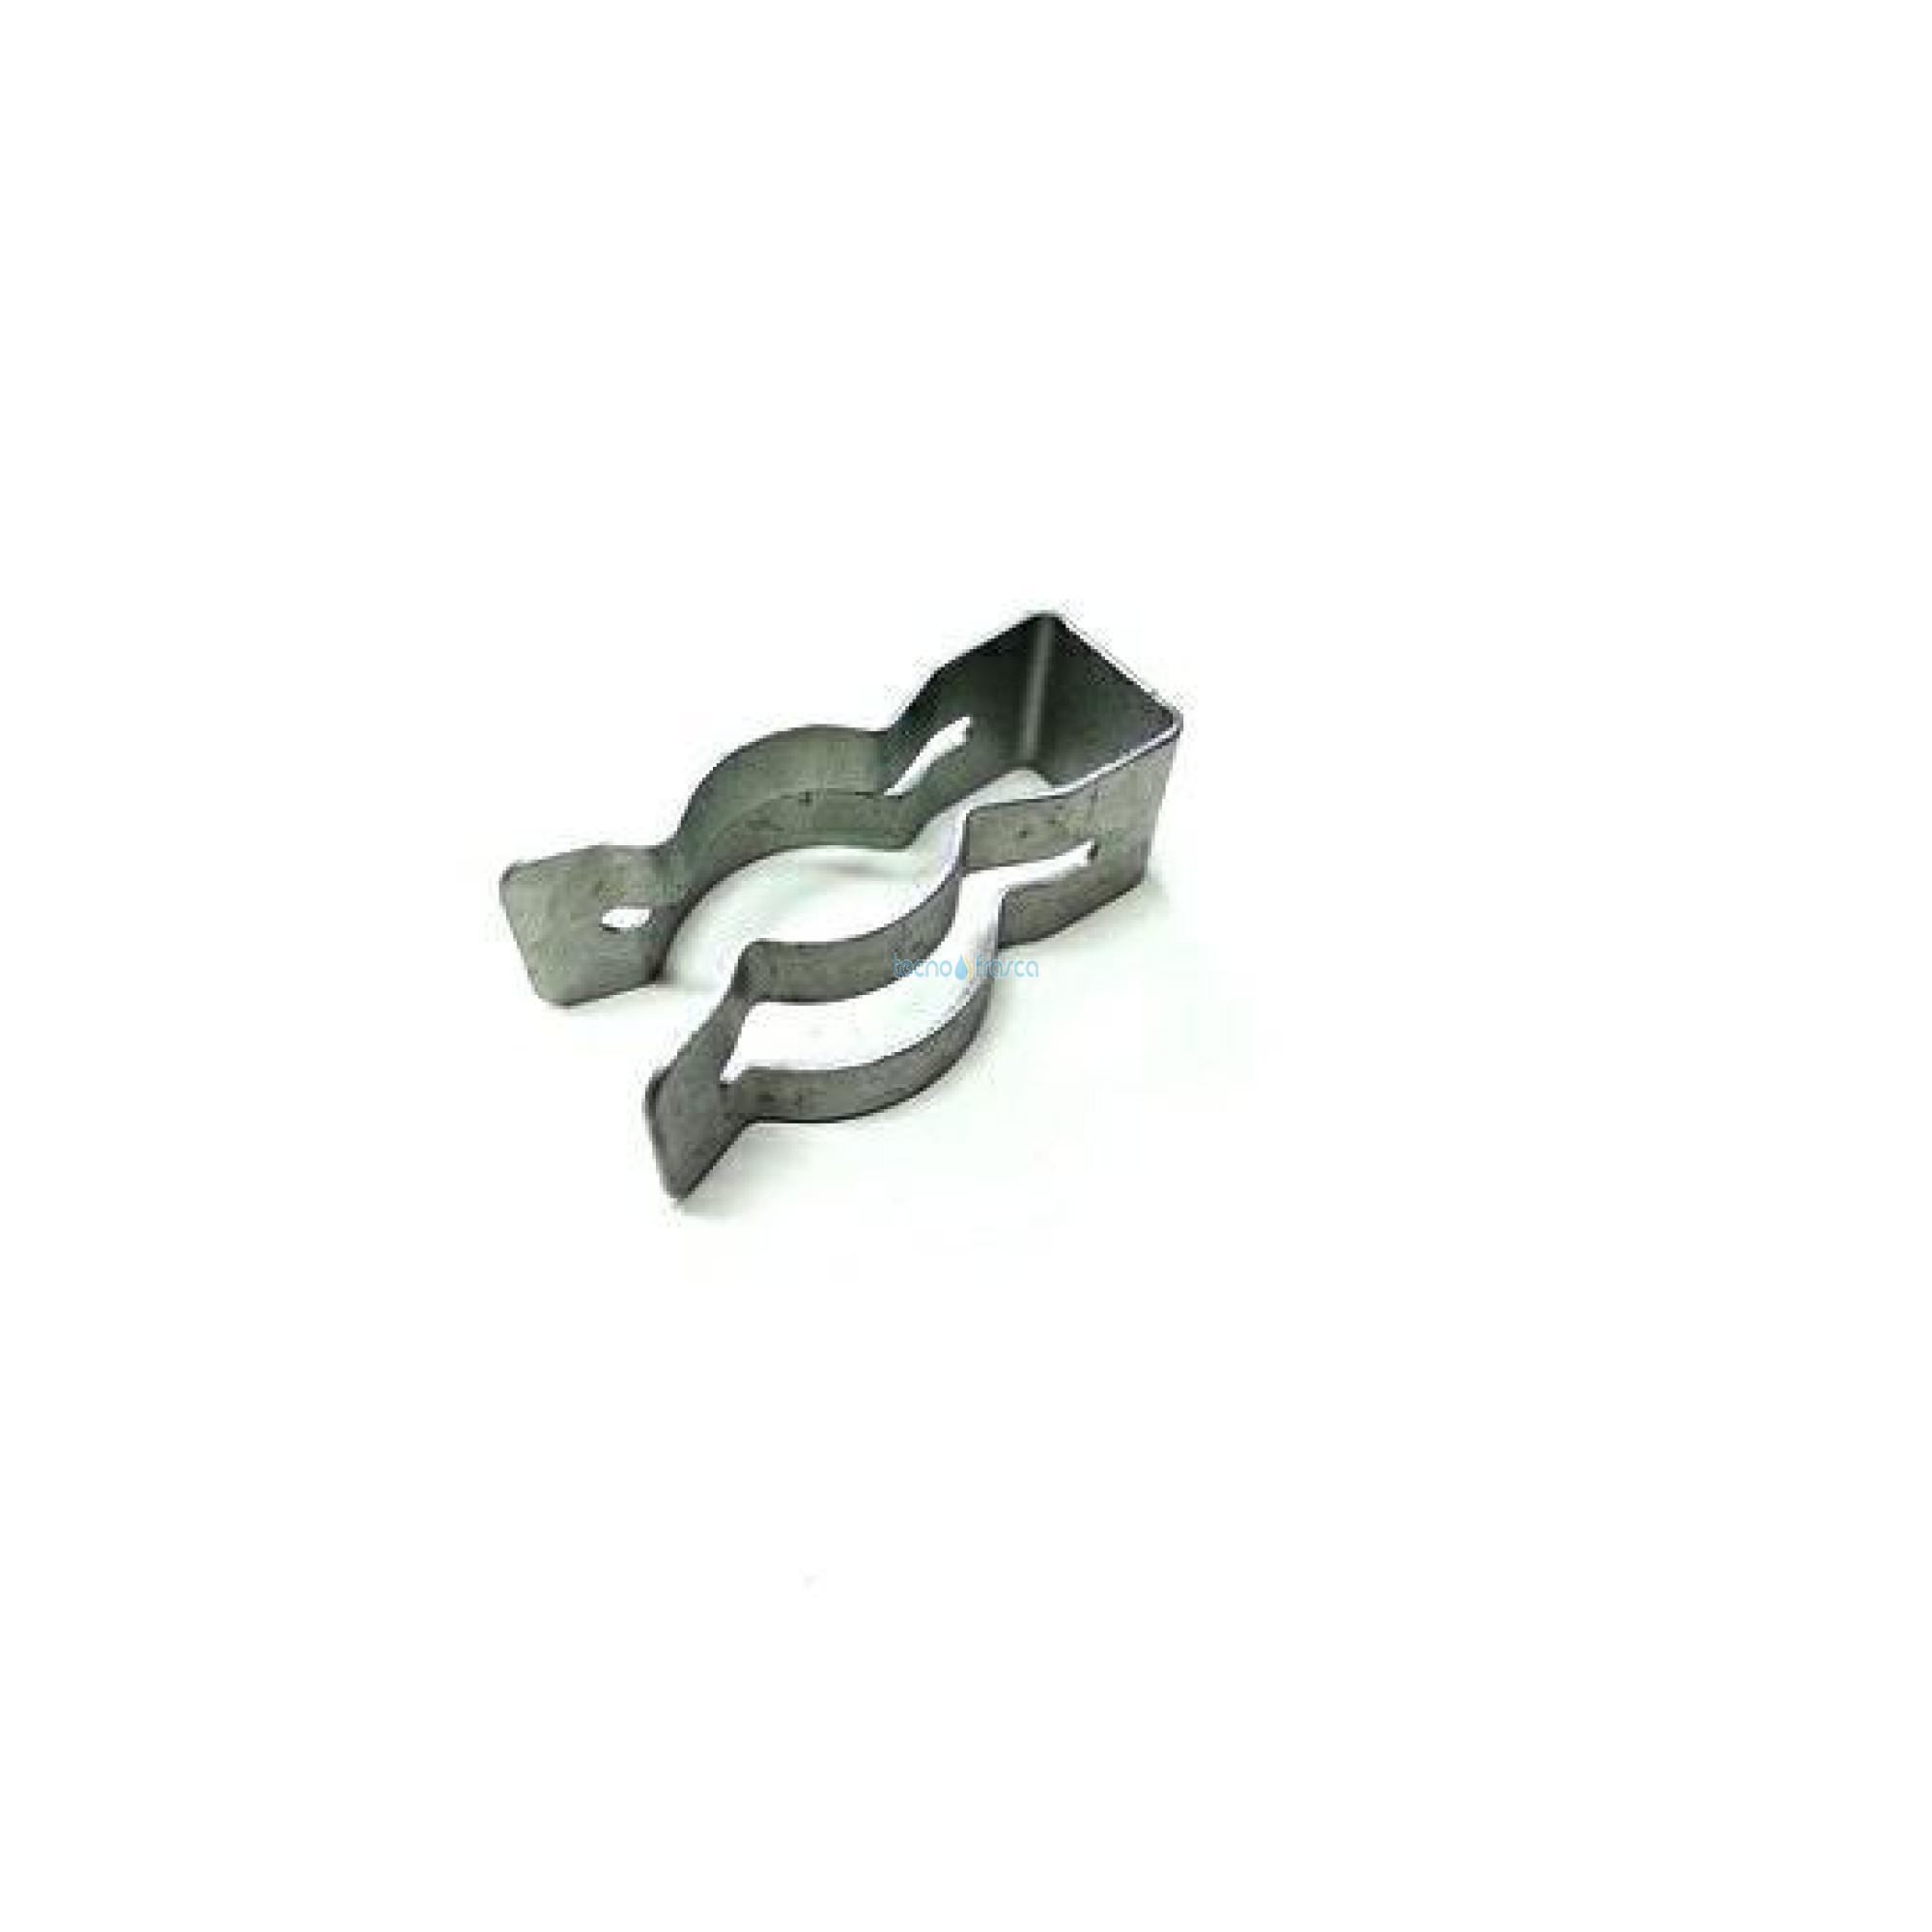 Baxi clip scambiatore primario JJJ005113650